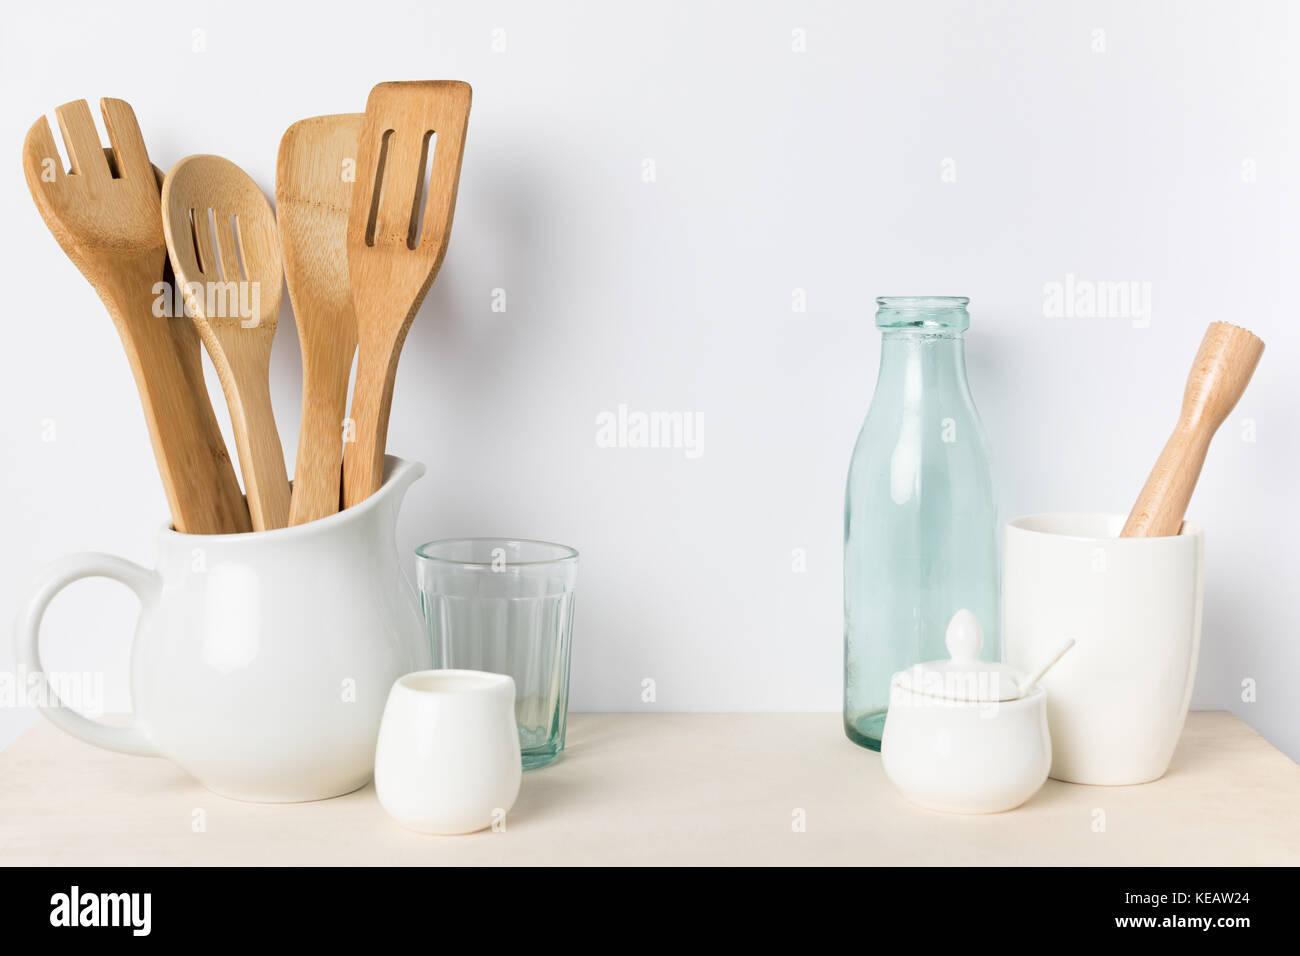 empty kitchen utensils - Stock Image